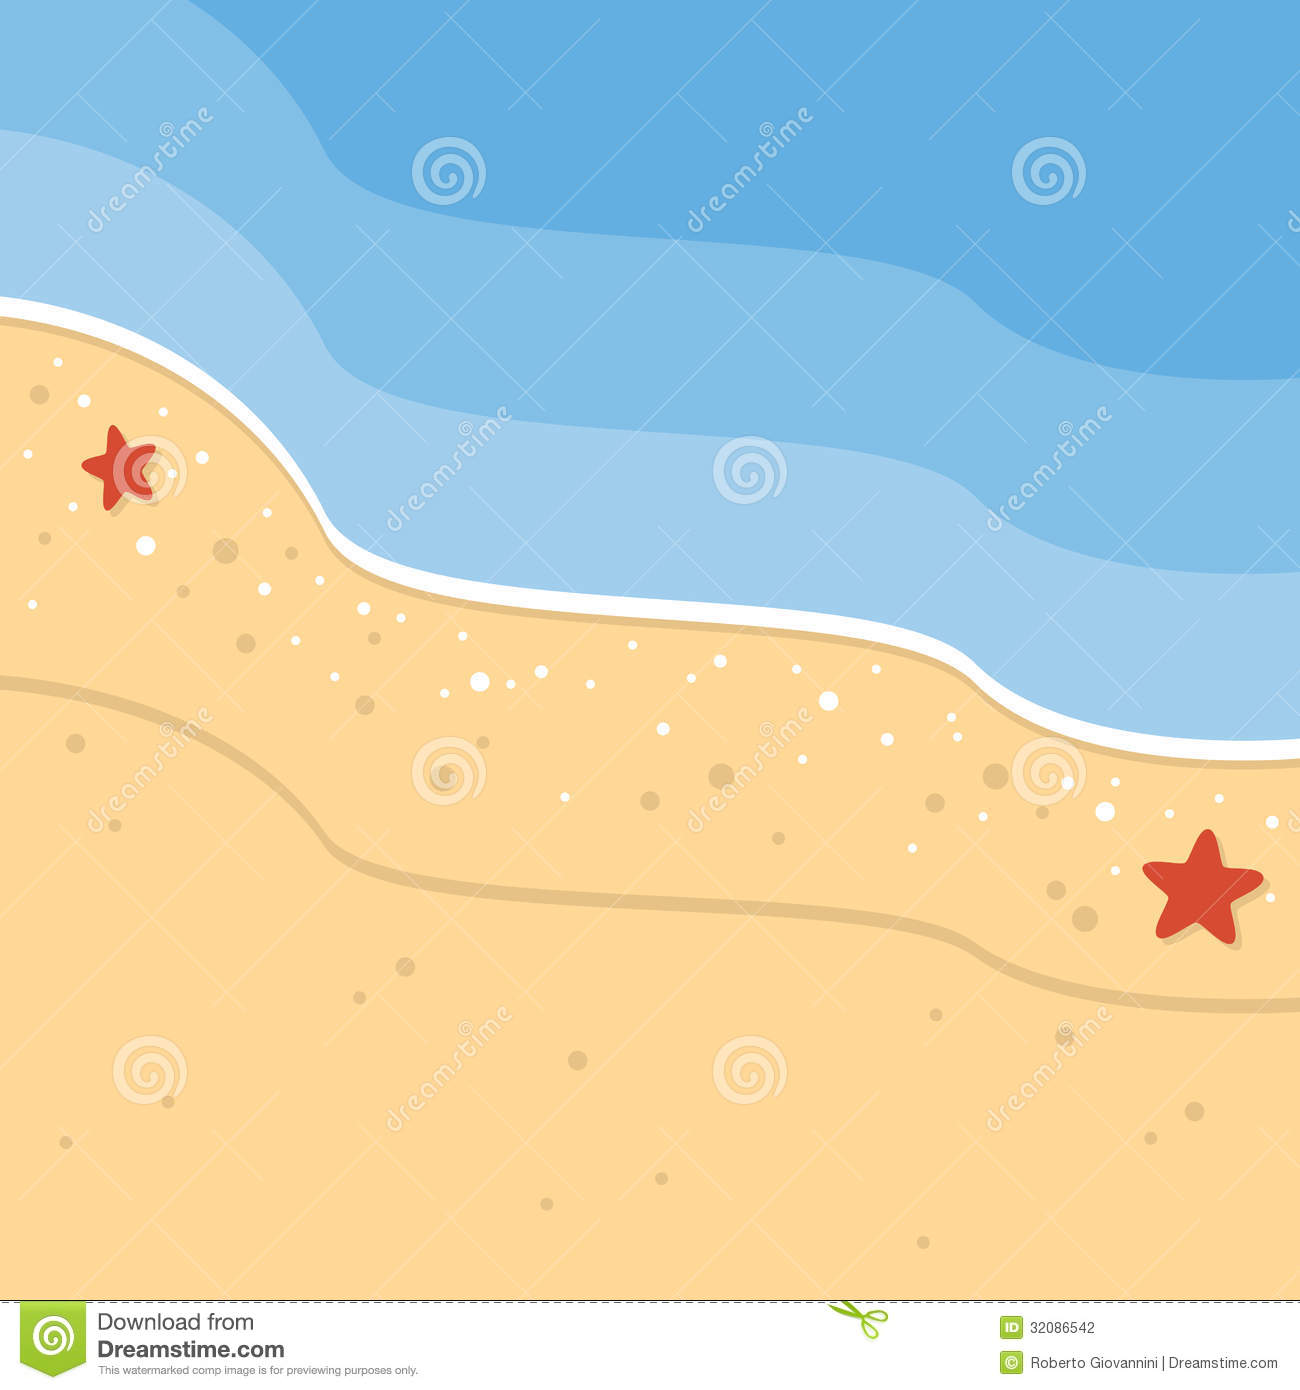 Sea Sand Clipart.